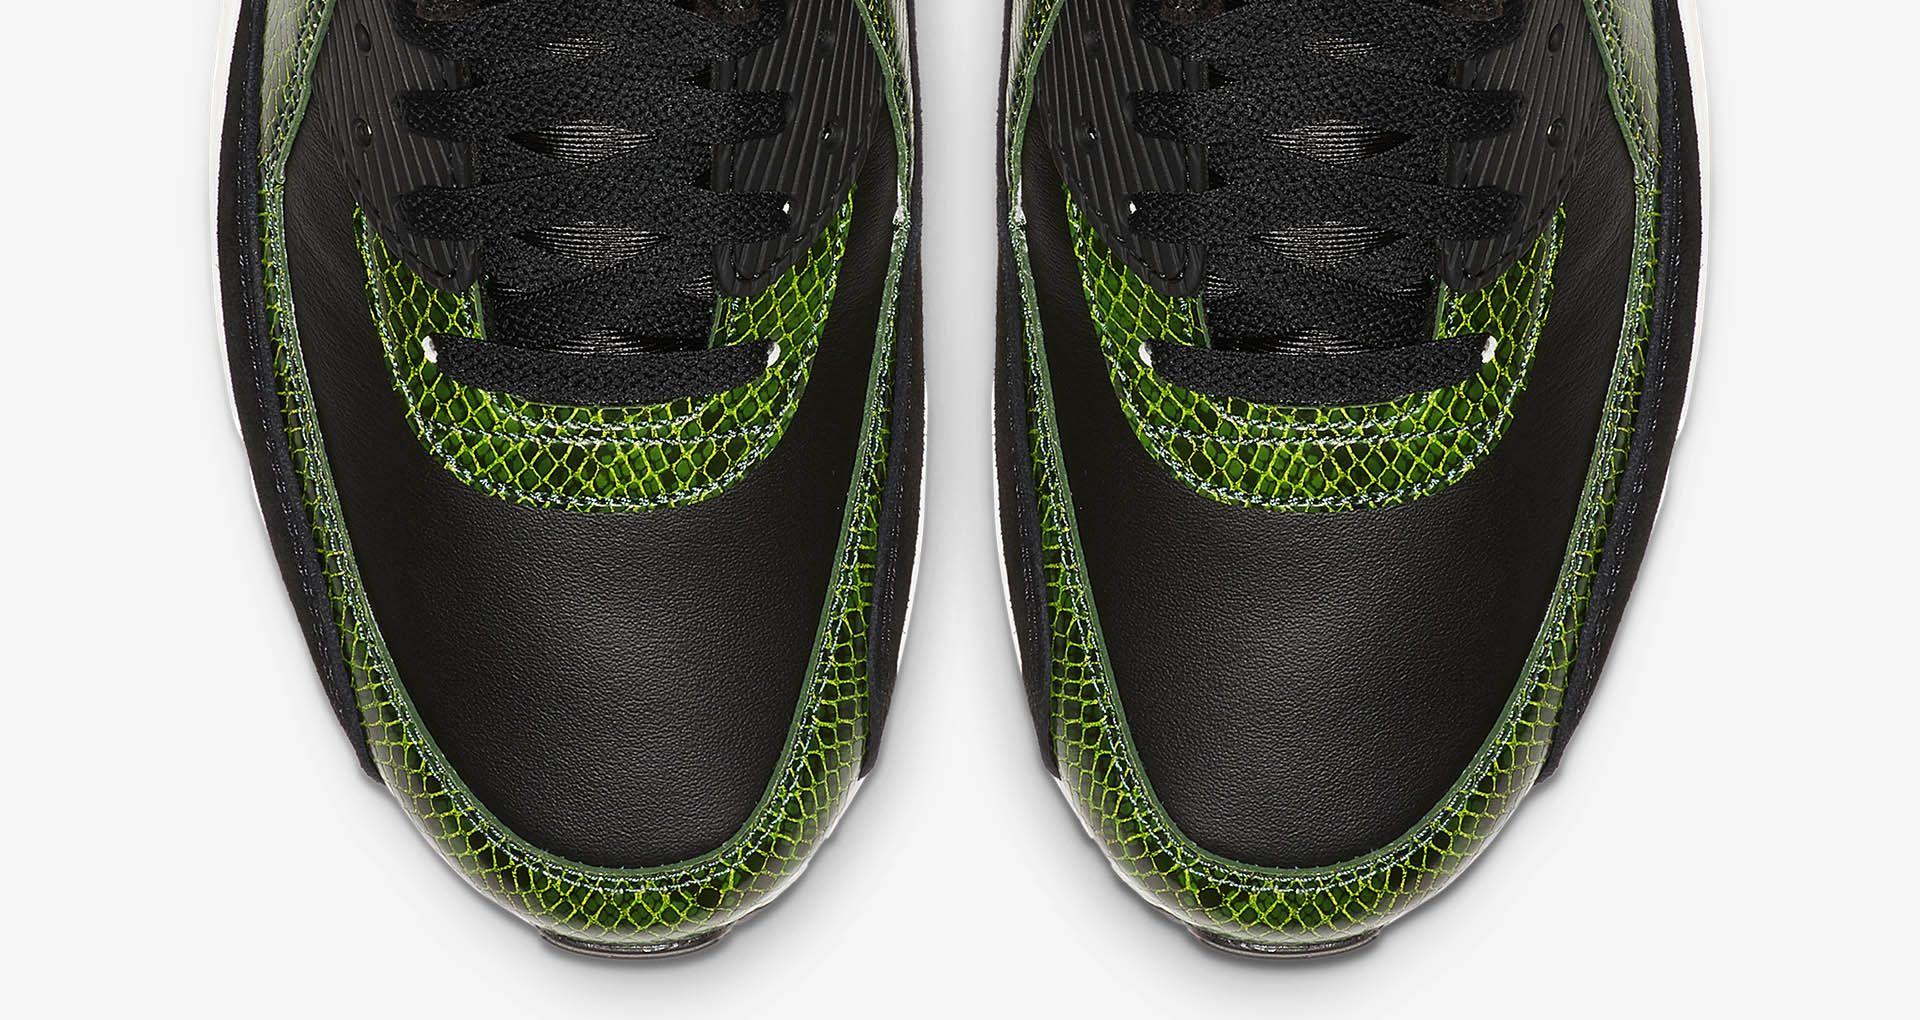 08-nike-air-max-90-green-python-cd0916-001